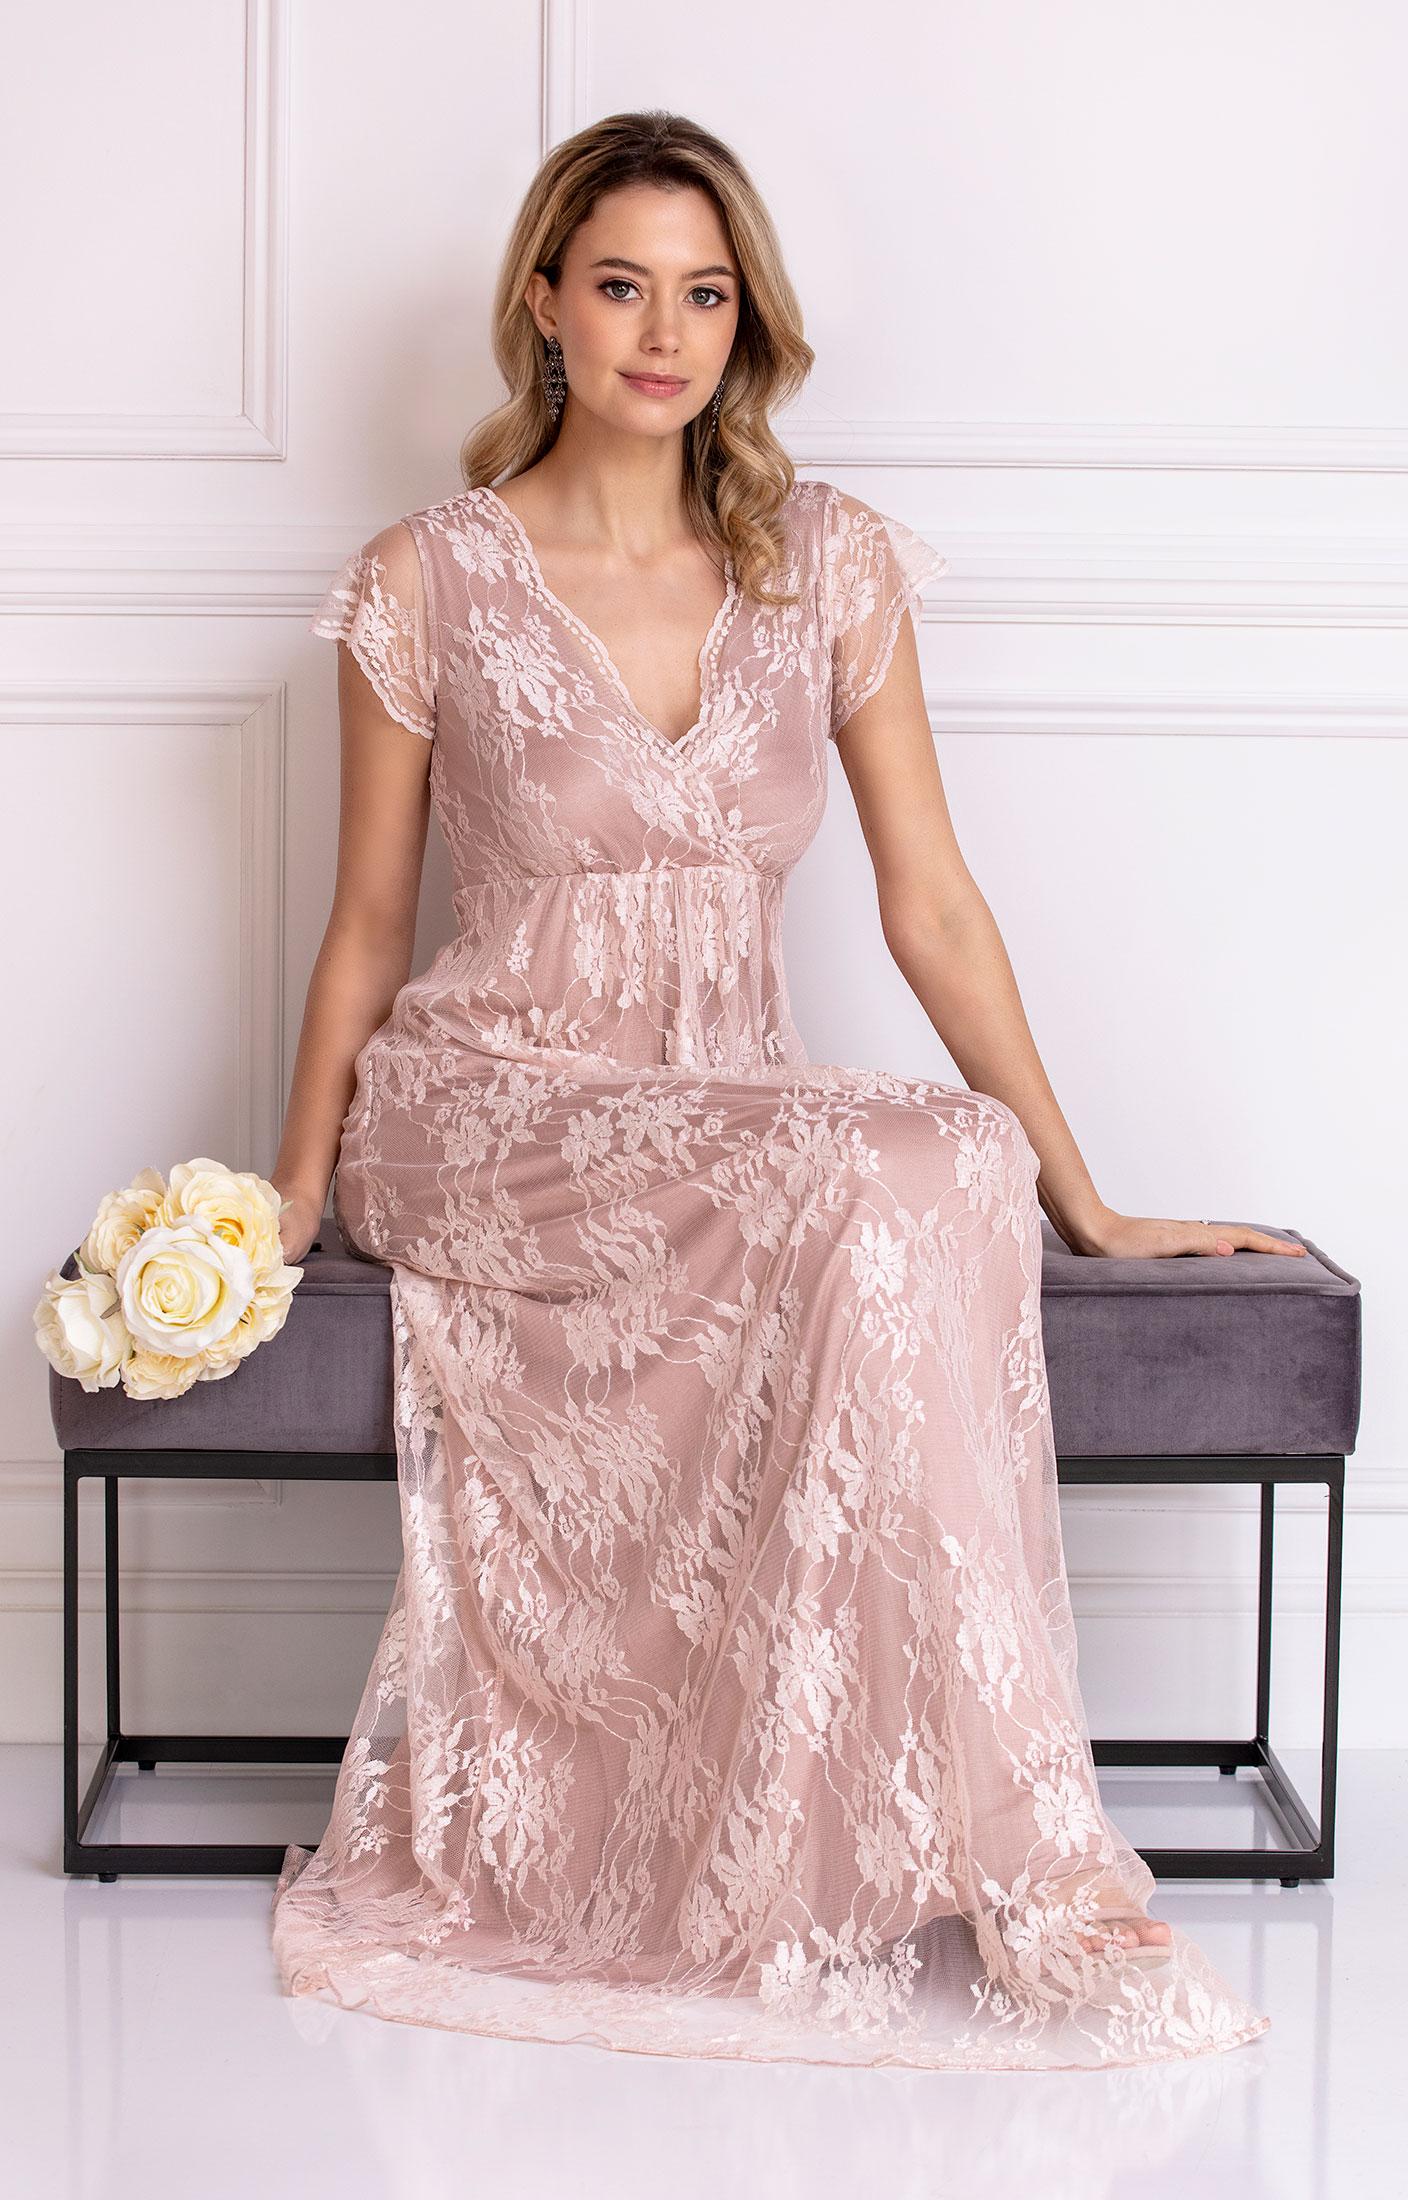 92340cd4a09 Evangeline Evening Gown (Blush) - Evening Dresses